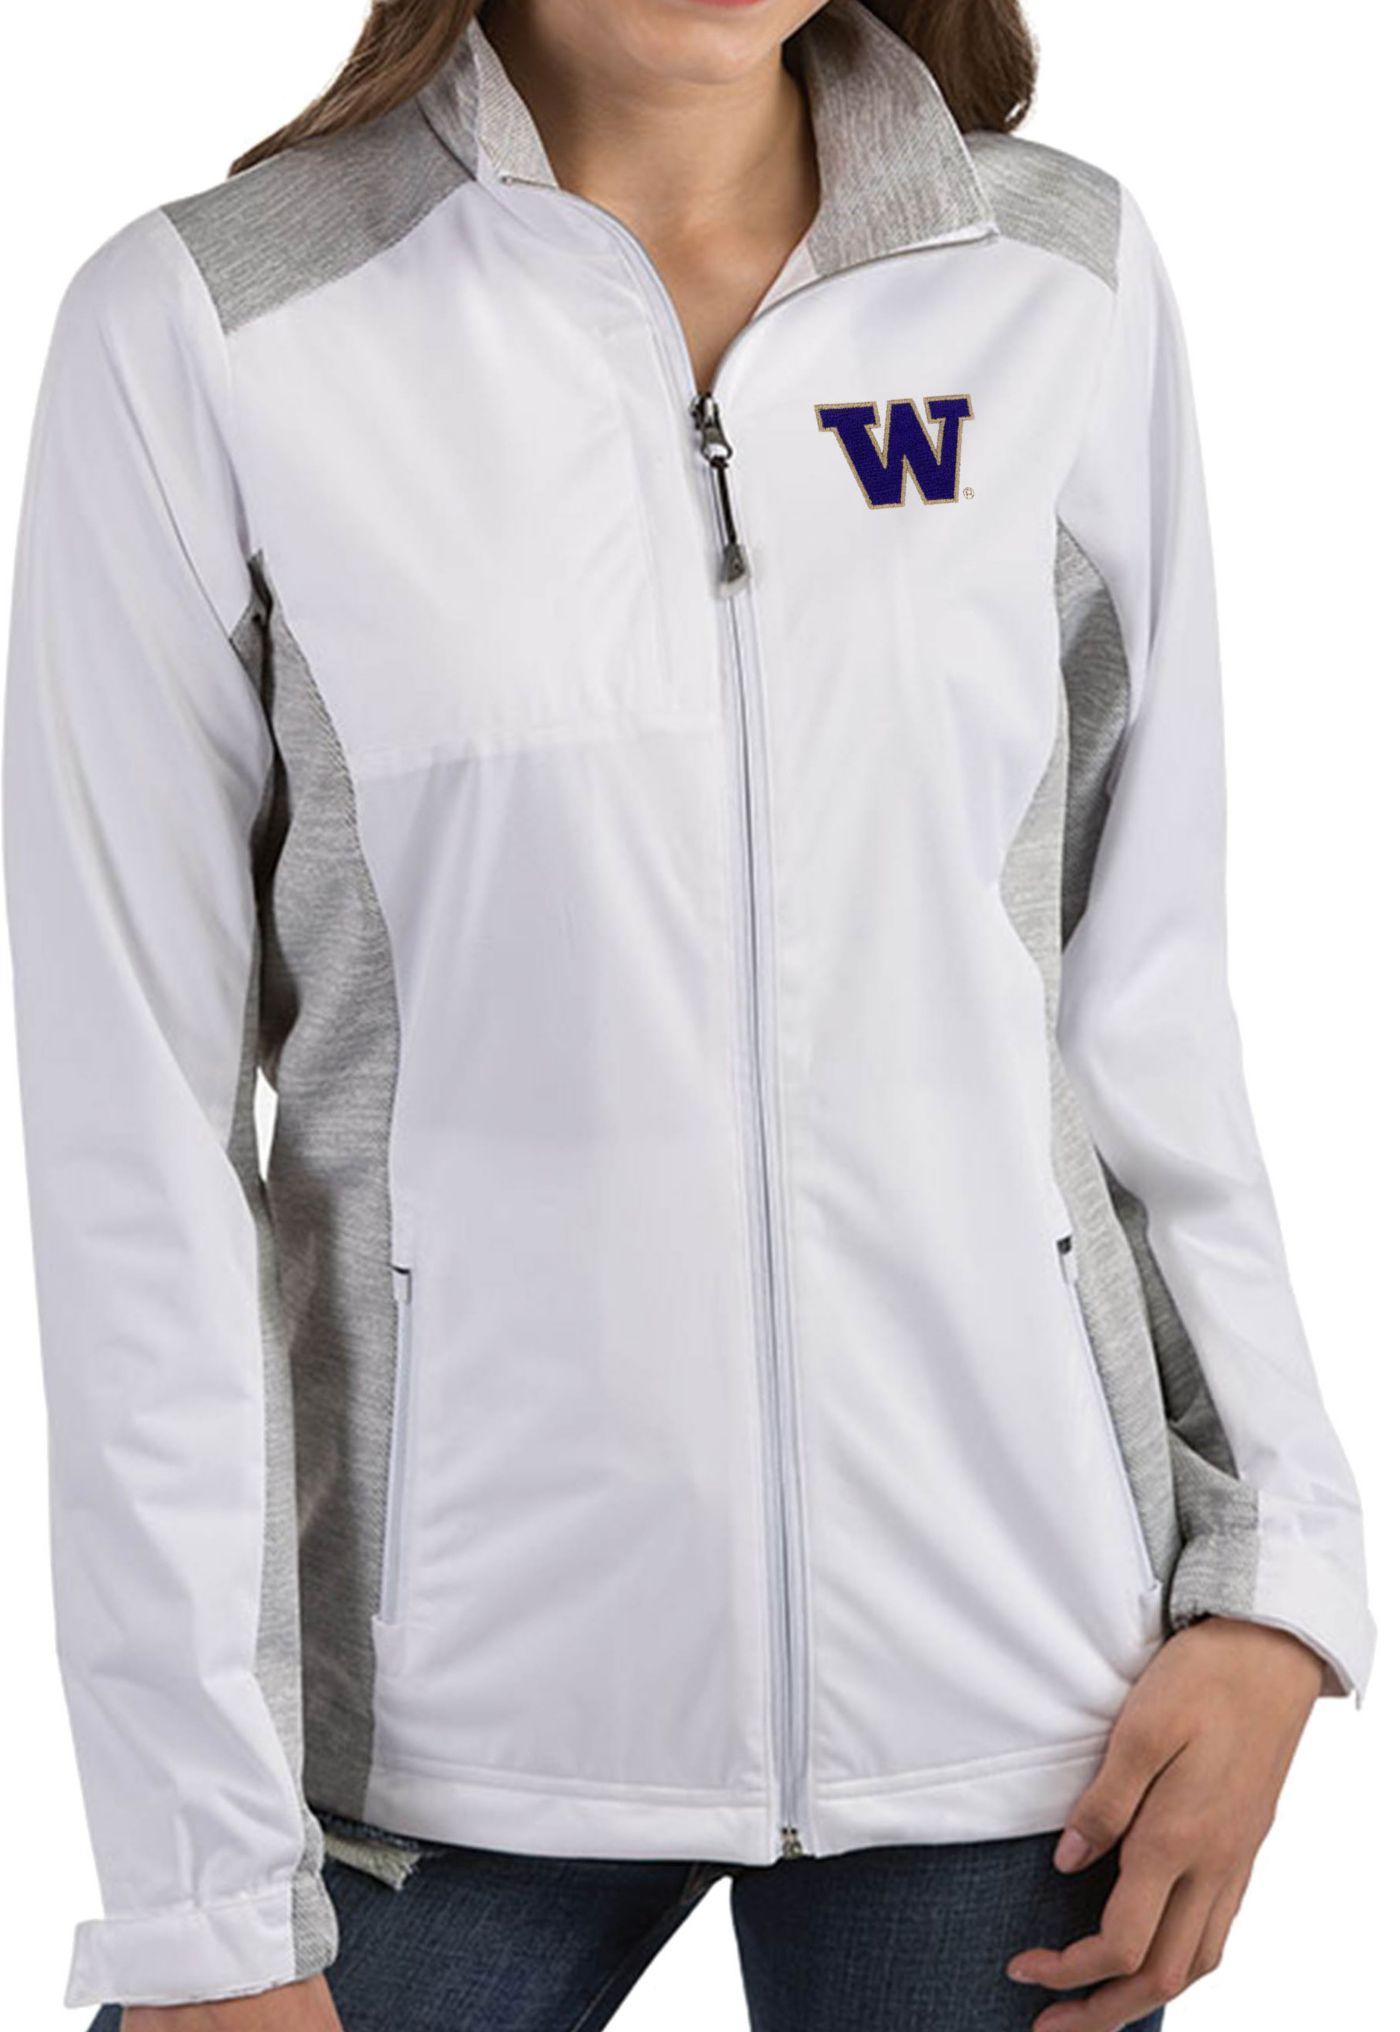 Antigua Women's Washington Huskies Revolve Full-Zip White Jacket